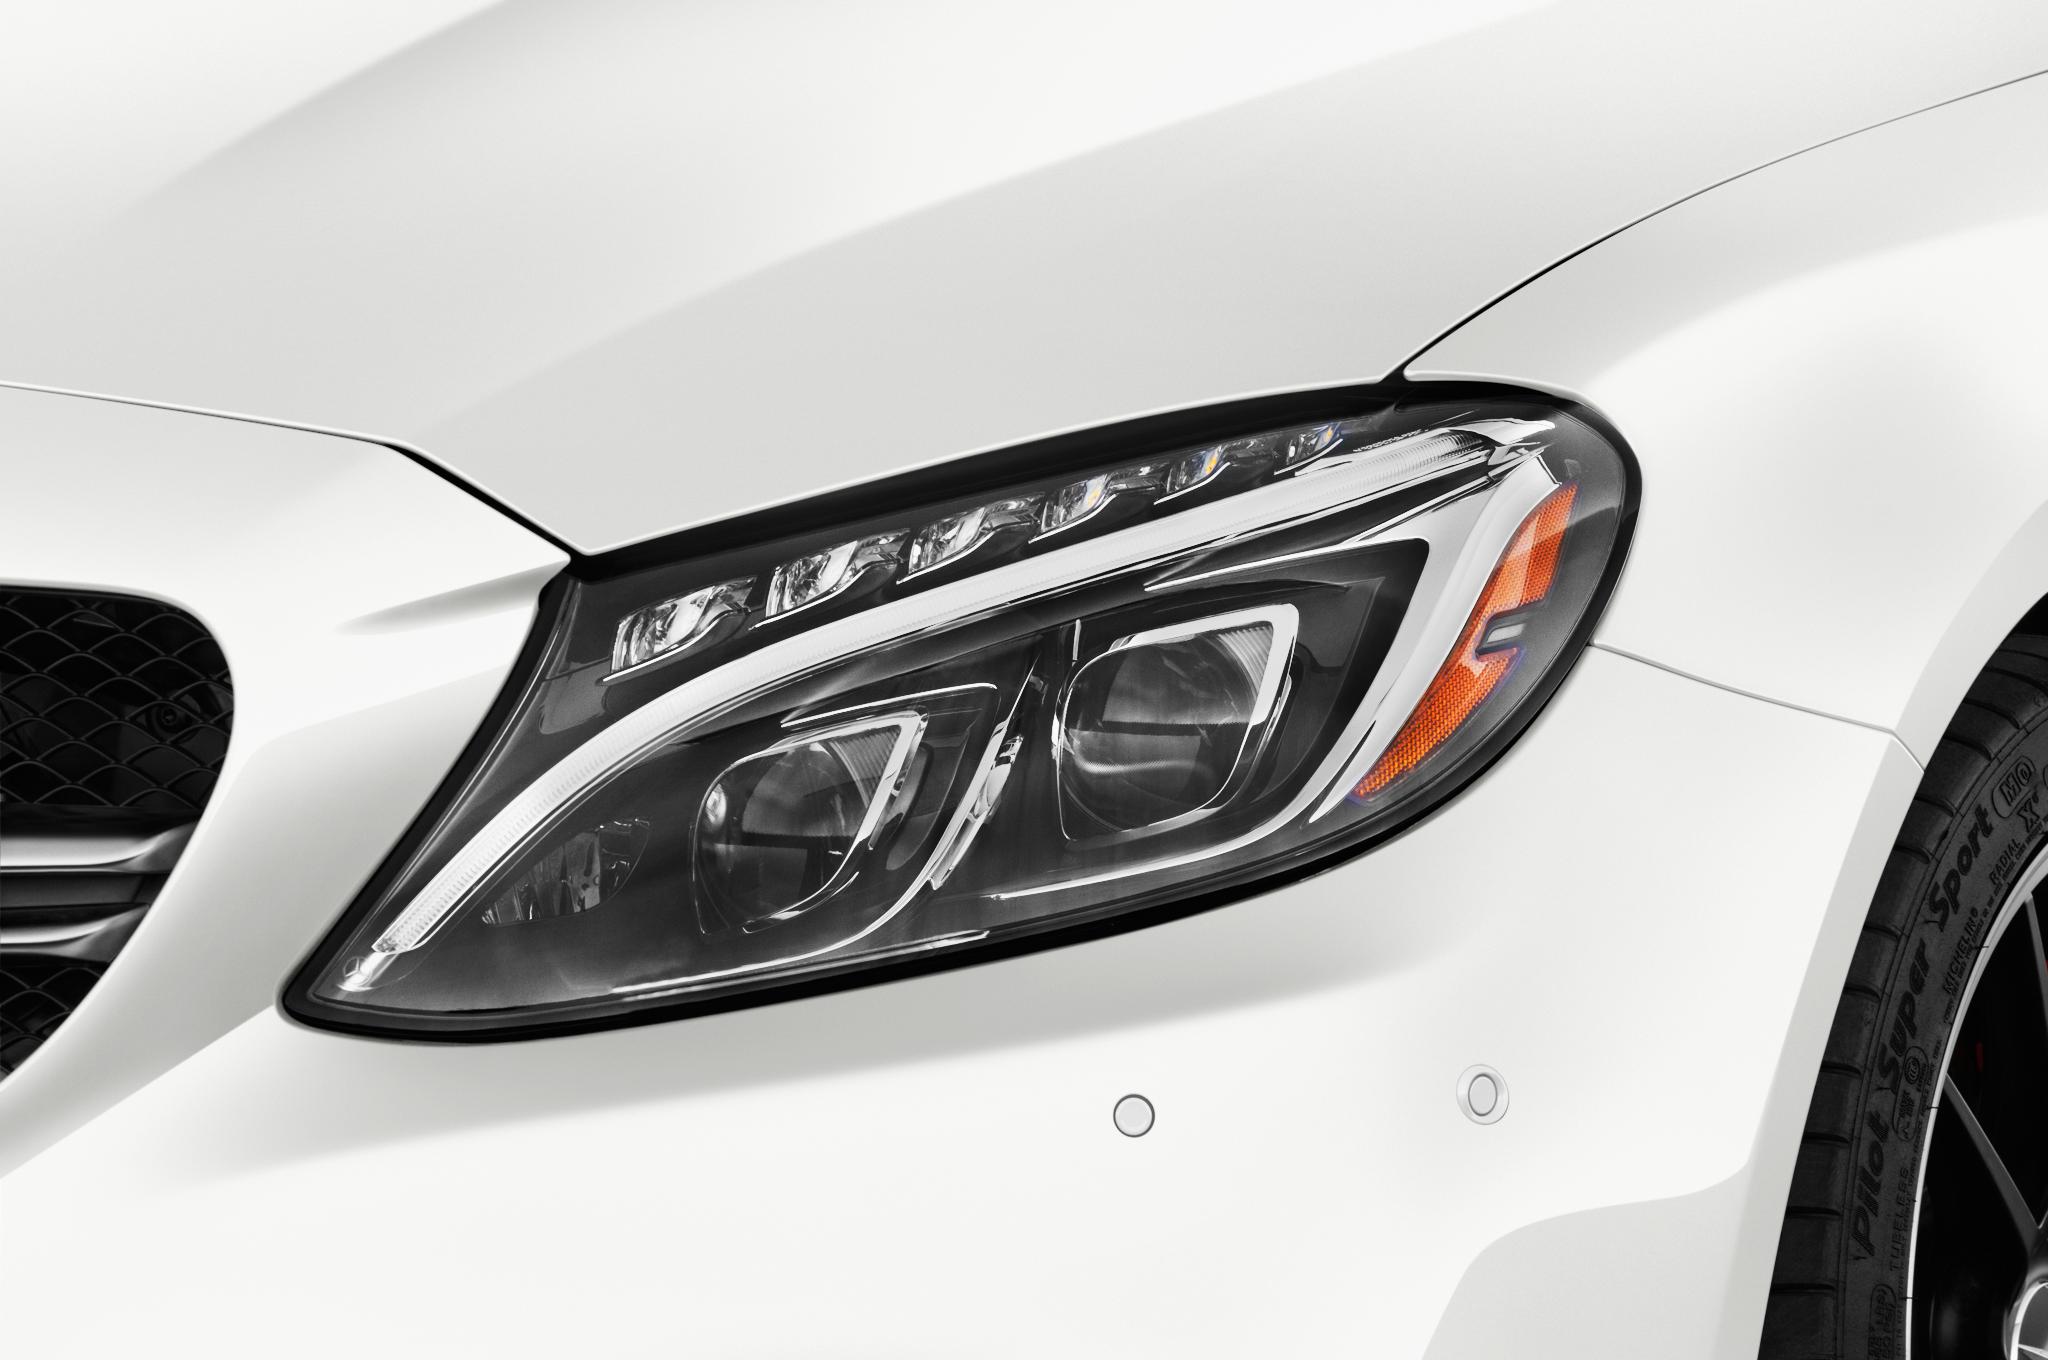 2018 Mercedes-Benz C-Class Spied with Tweaks | Automobile